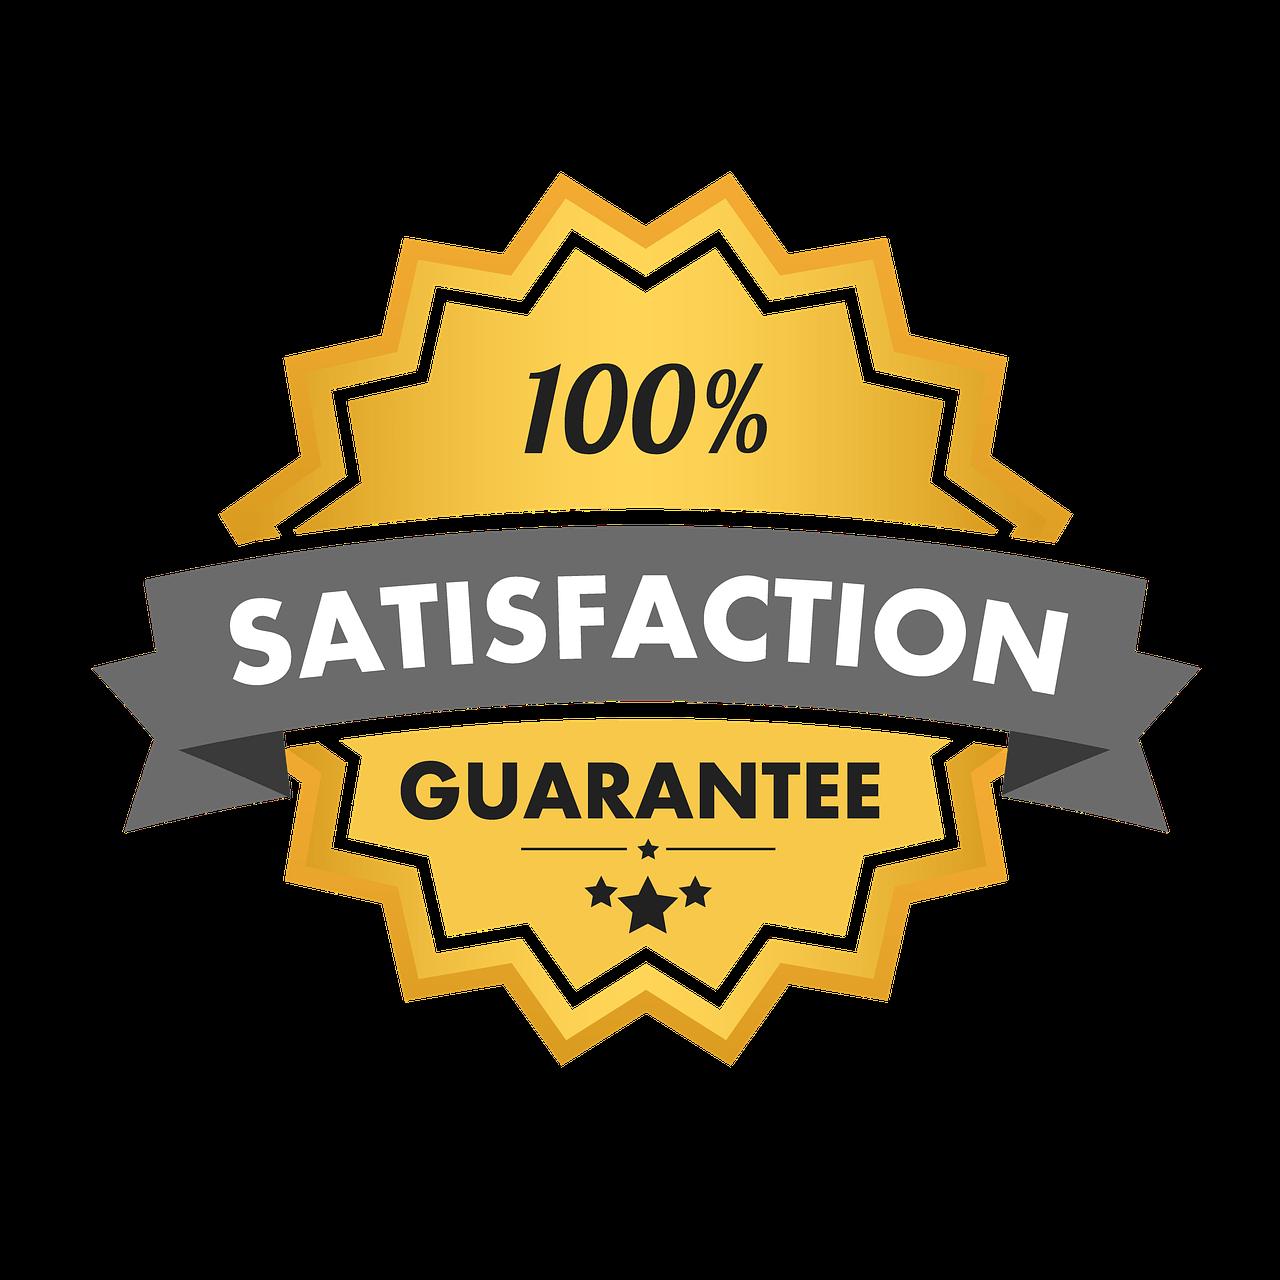 satisfaction-guarantee-large